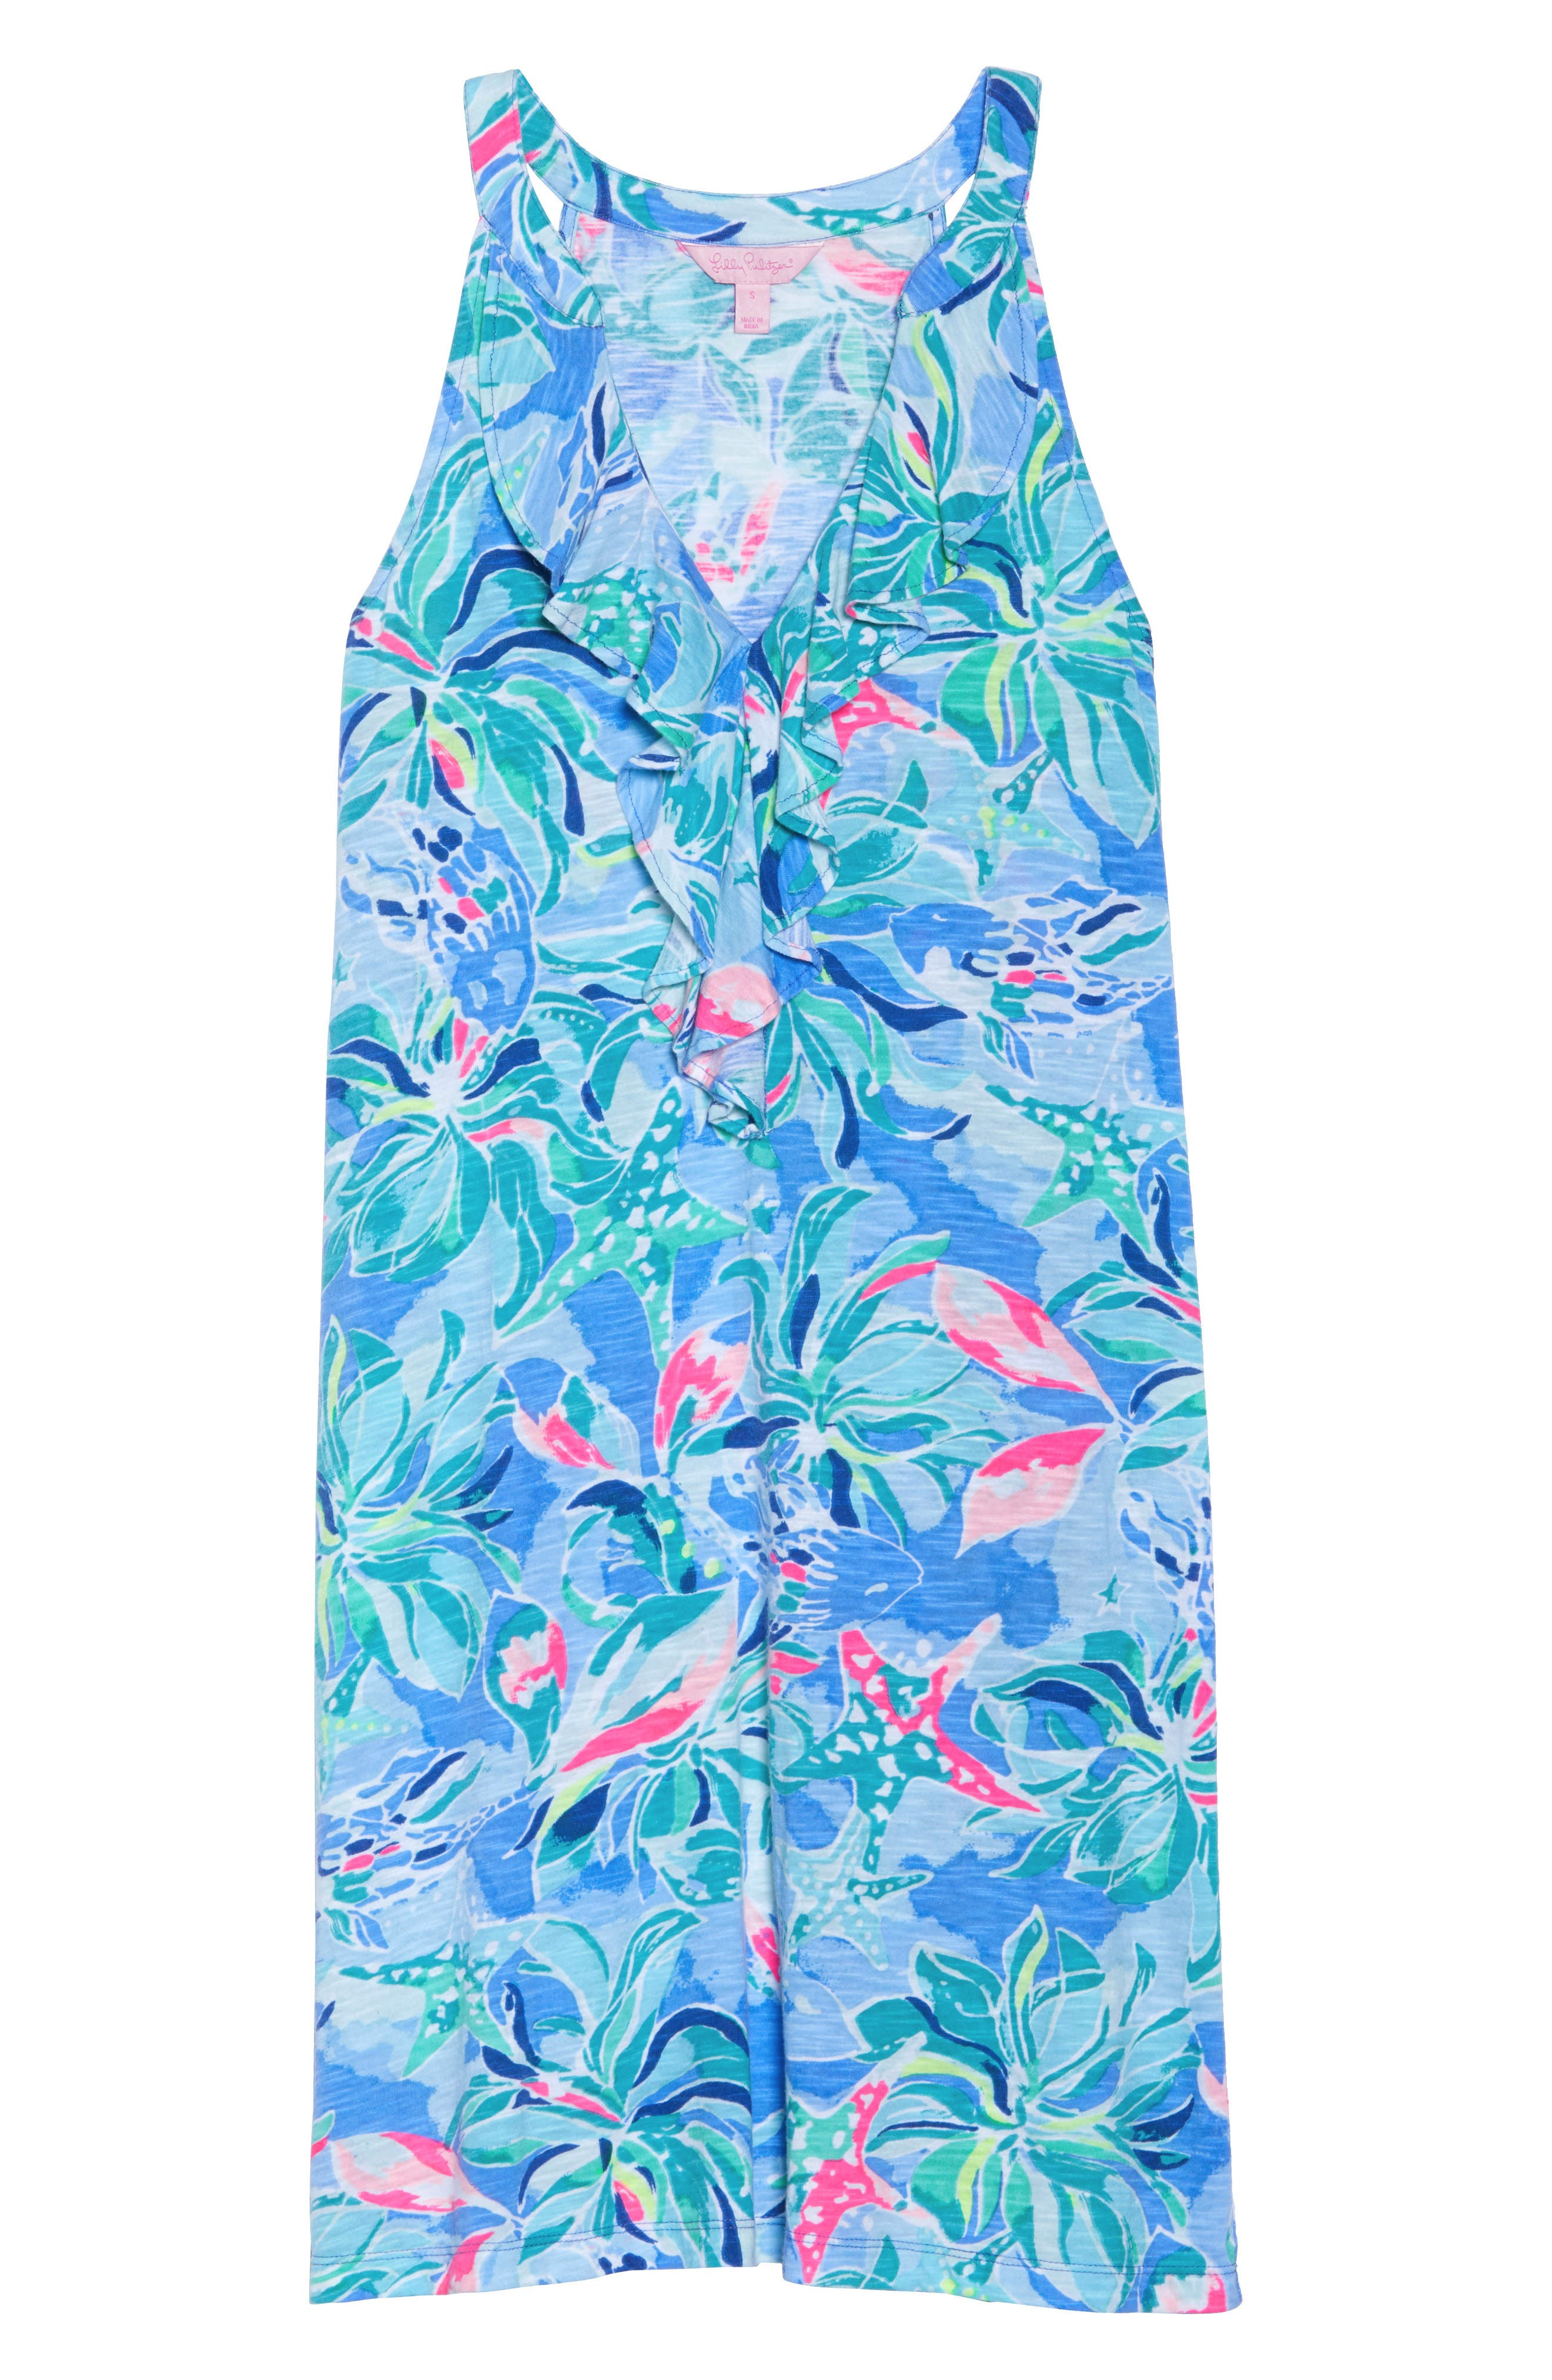 Shay Ruffle Halter Dress,                             Alternate thumbnail 6, color,                             Bennet Blue Celestial Seas